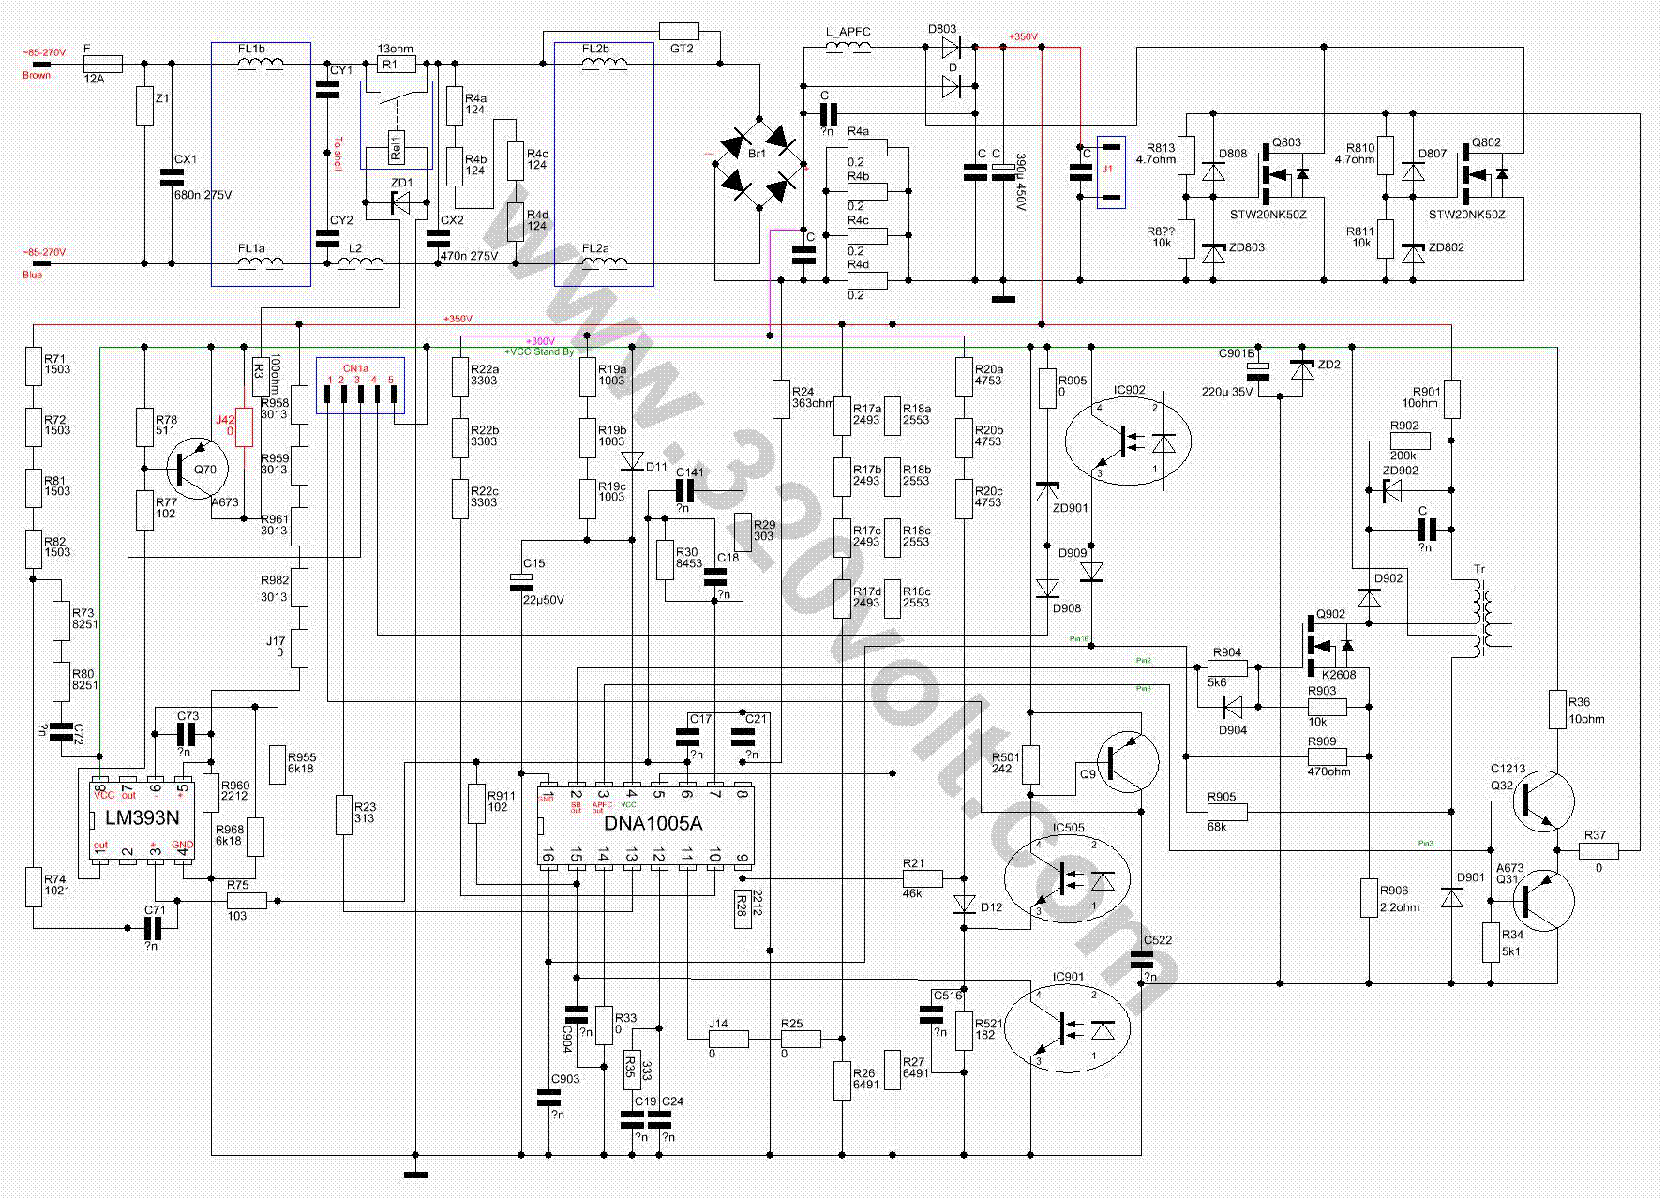 Atx Smps Atx Smps Circuit Atx Smps Schematic Tl494 Atx